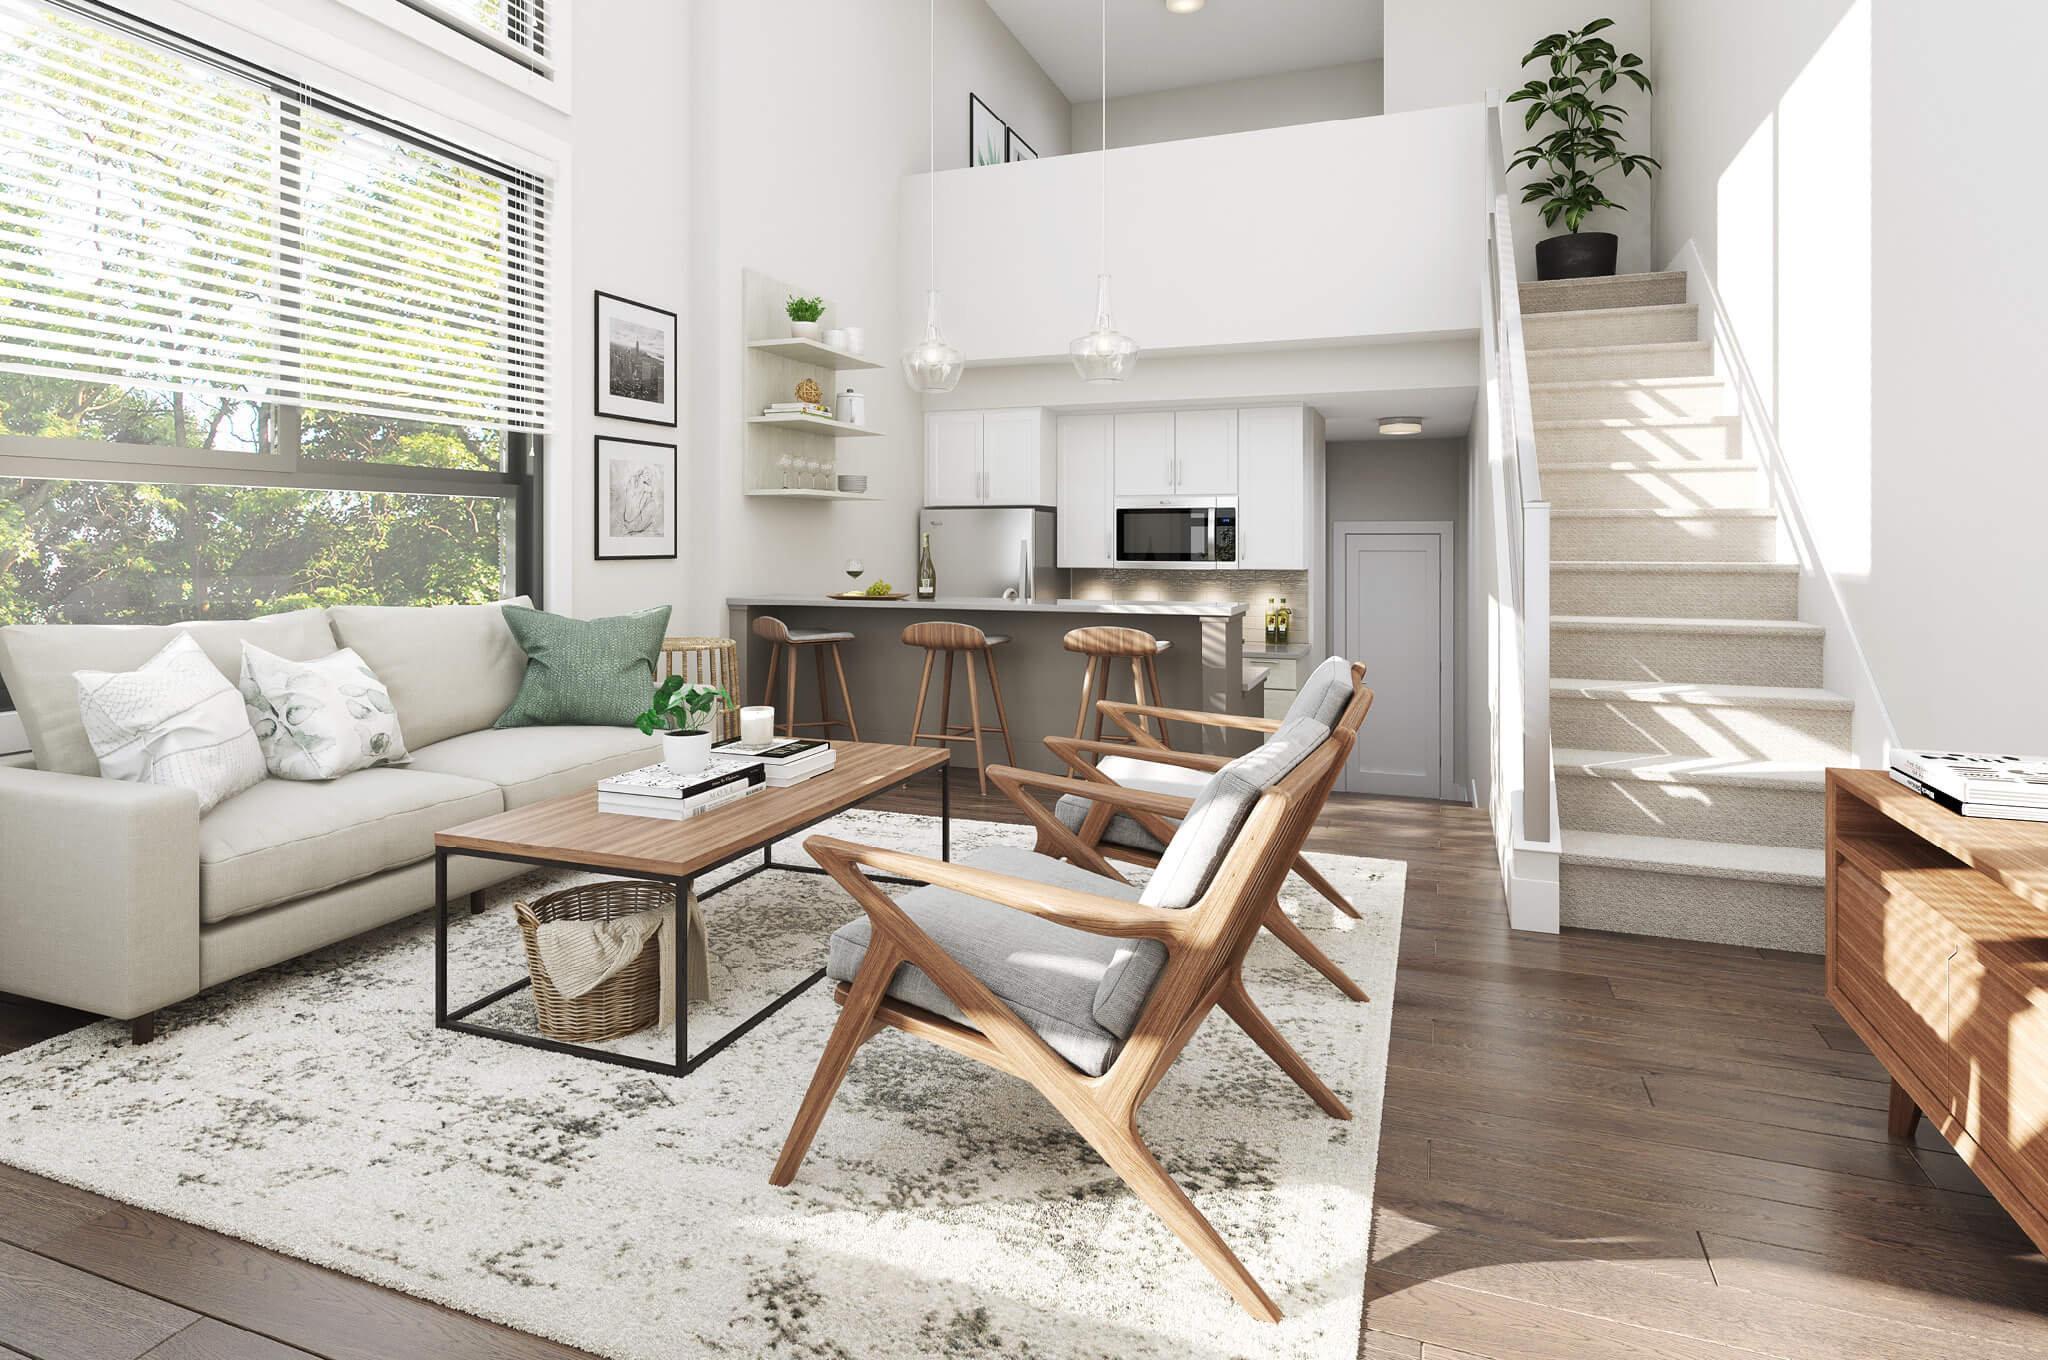 Living Area - 32838 Ventura Ave, Abbotsford, BC V2S 6J3, Canada!